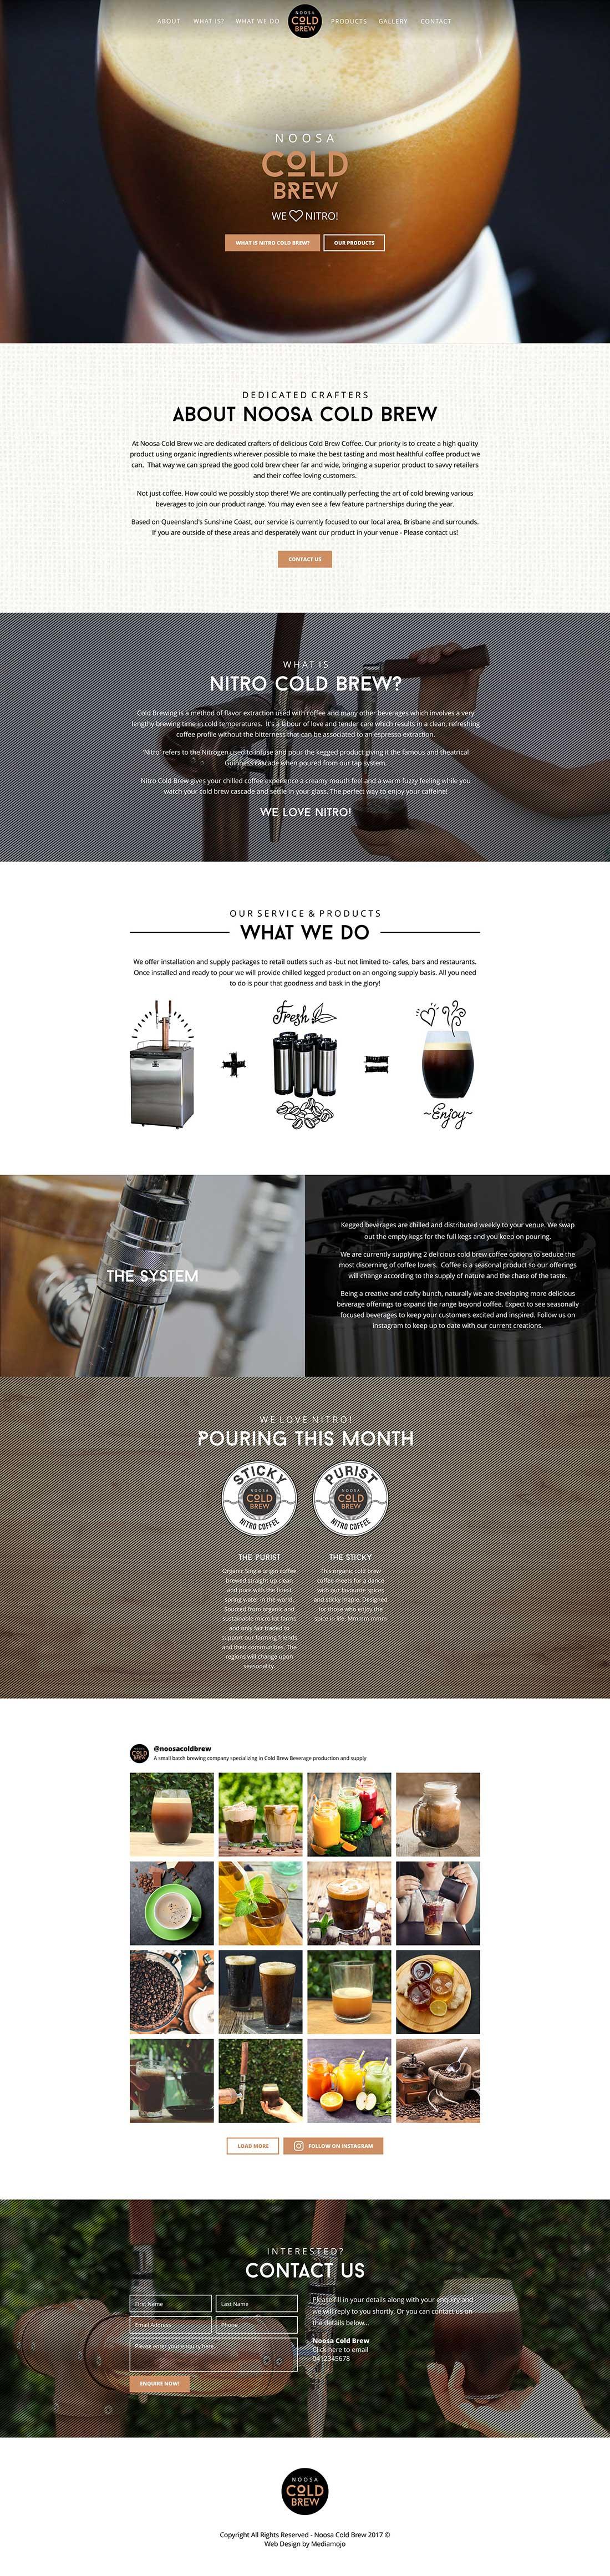 Noosa Cold Brew website home